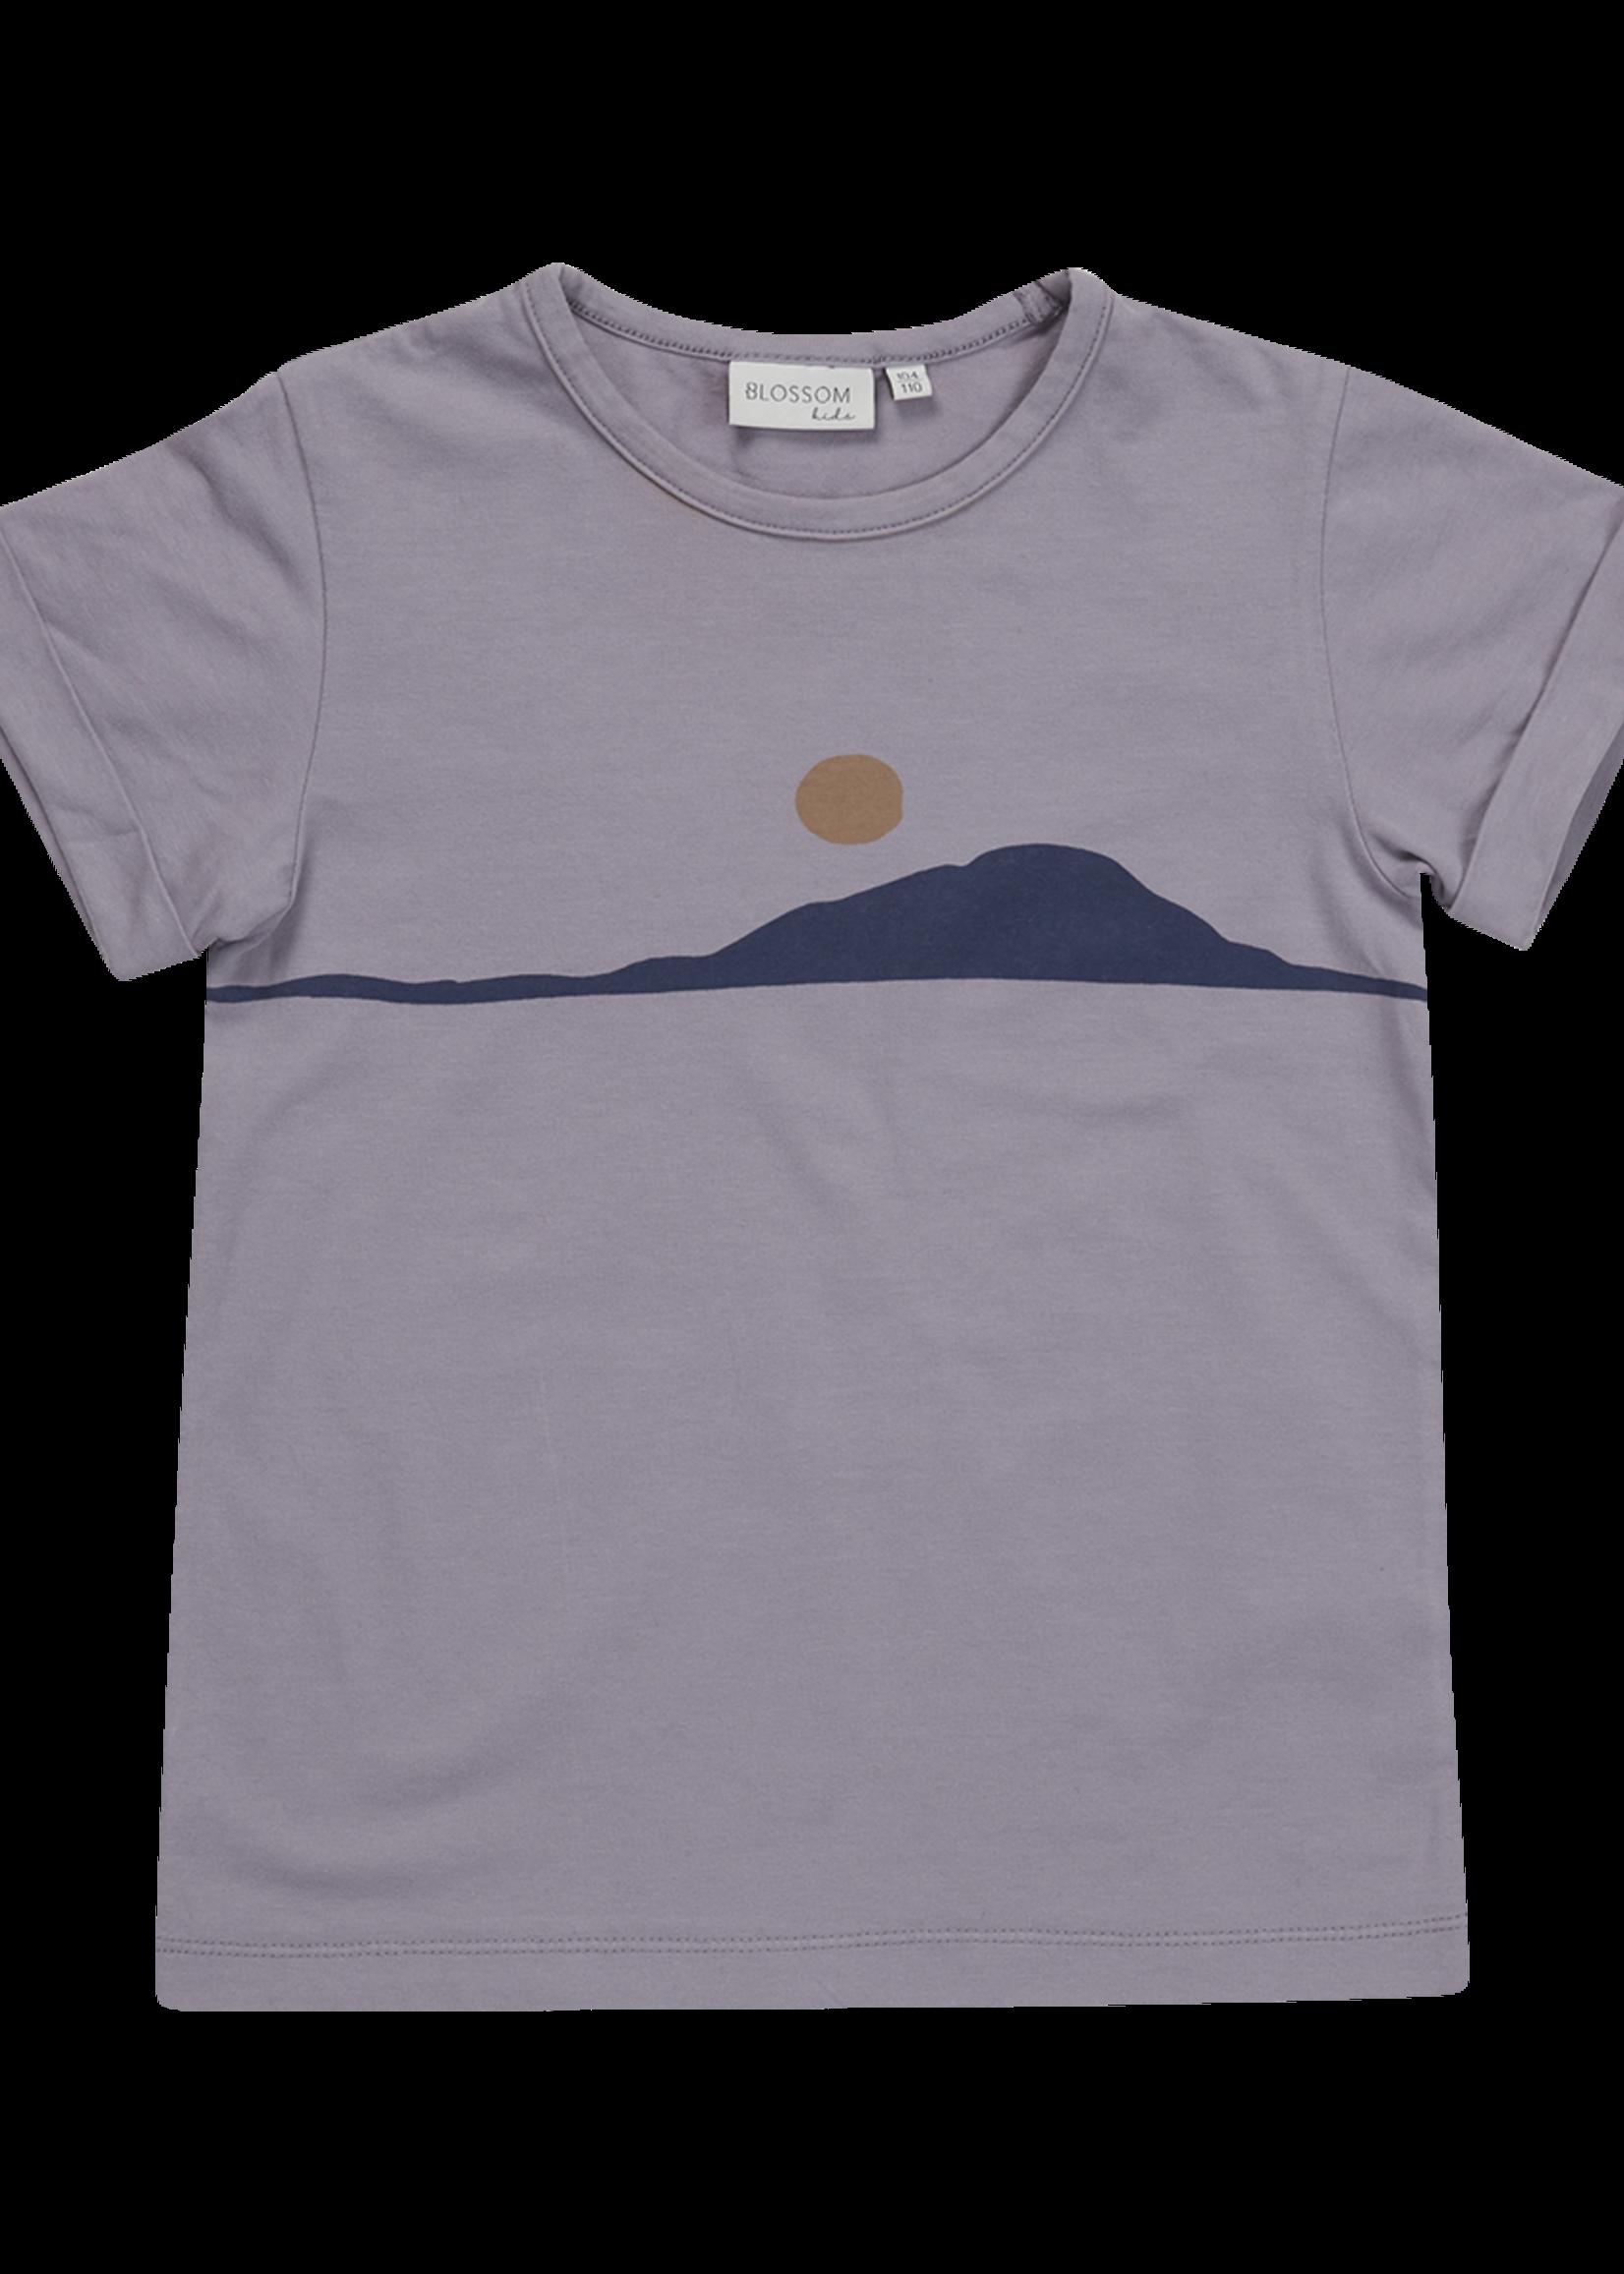 Blossom Kids BK - Tshirt Sunset Lilac Grey